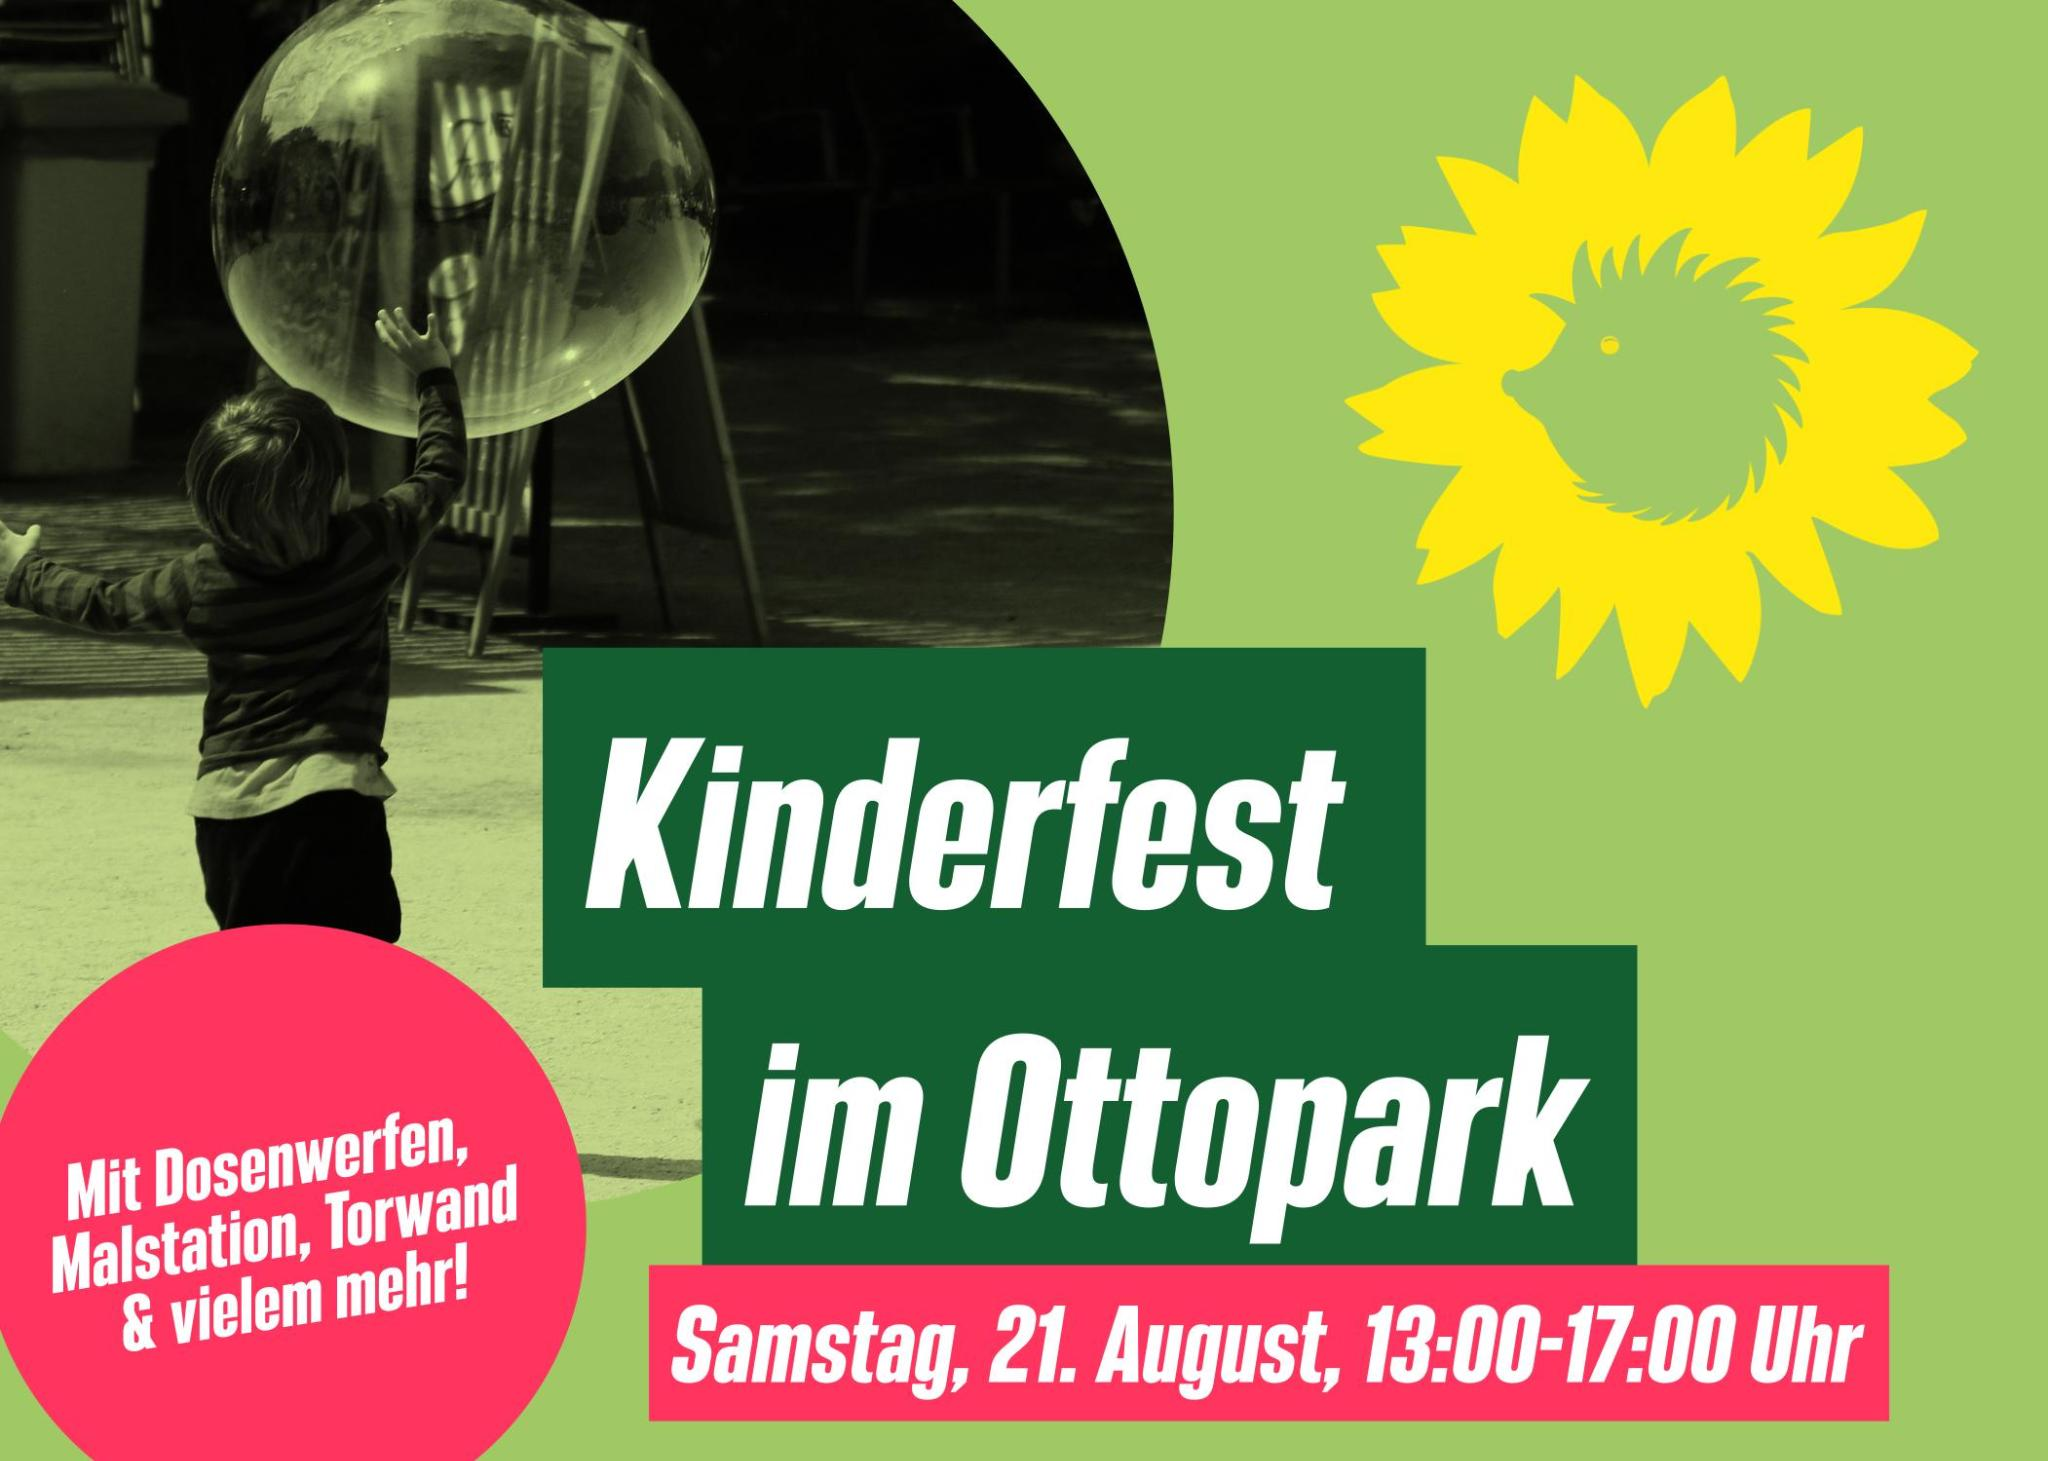 Kinderfest im Ottopark